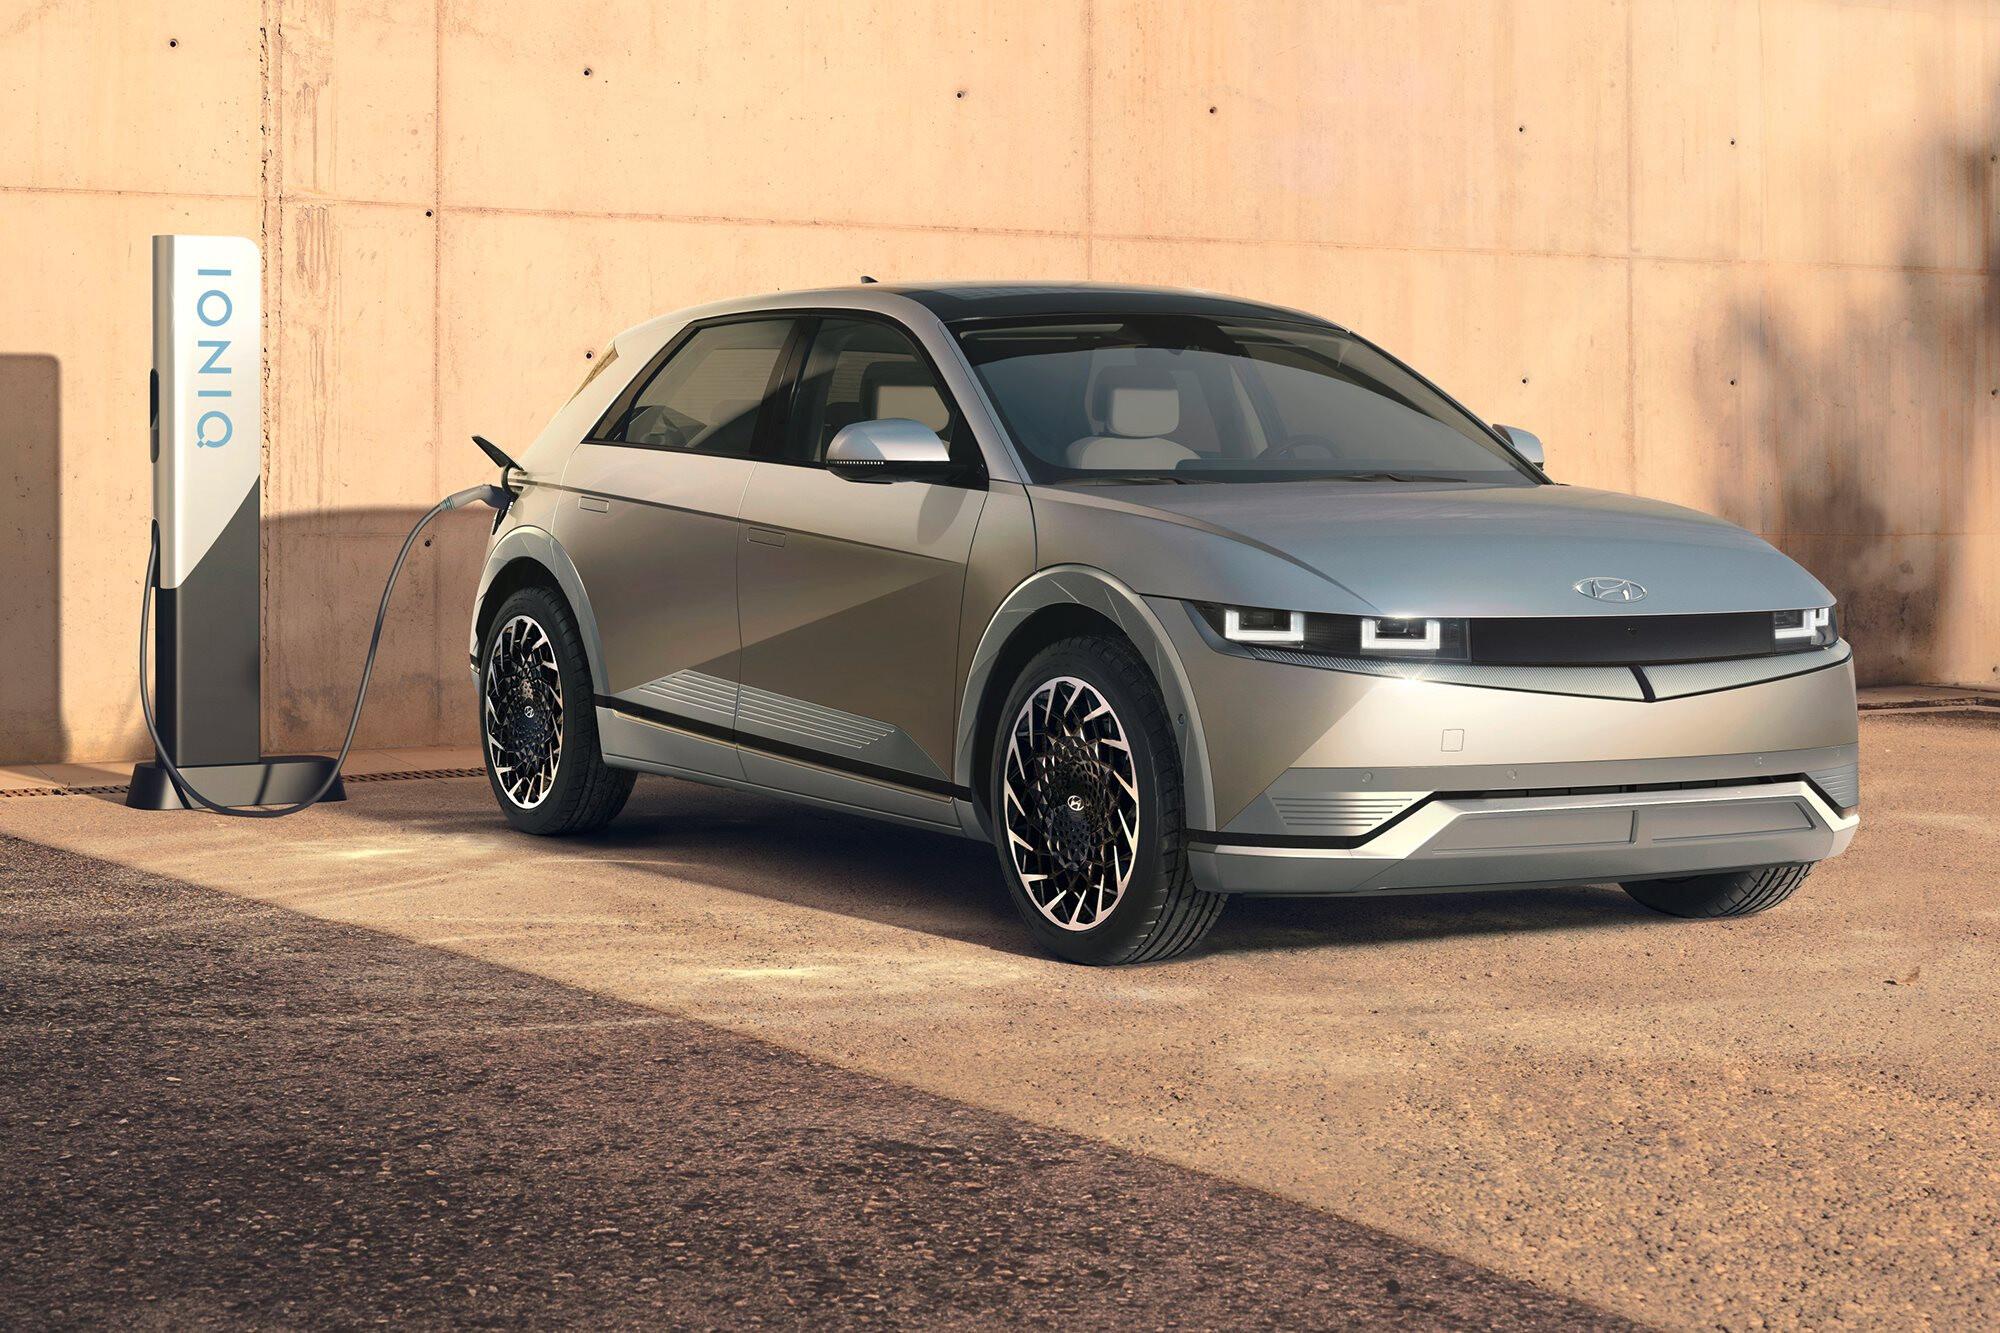 2022 Hyundai Ioniq 5 Electric Vehicle Revealed 1 Jpg